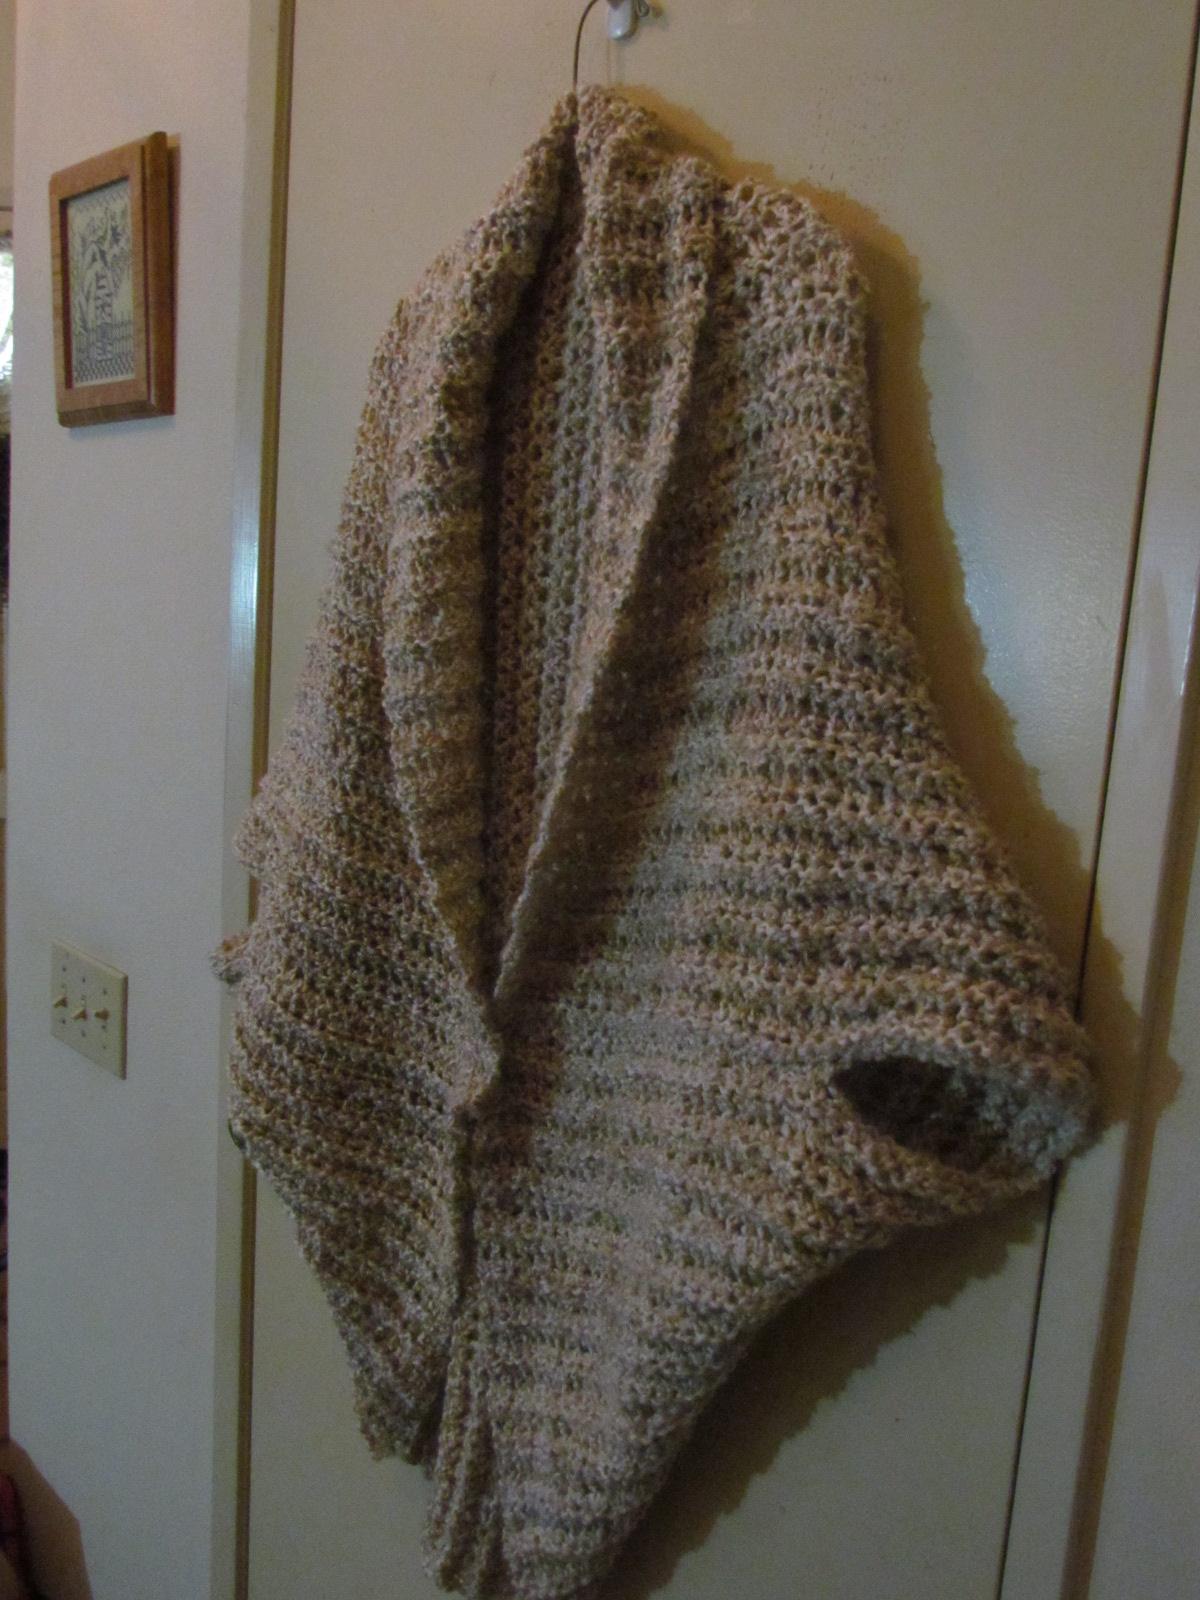 Jacqueline\'s Stitching & Musings: Simple Shrug Finished...